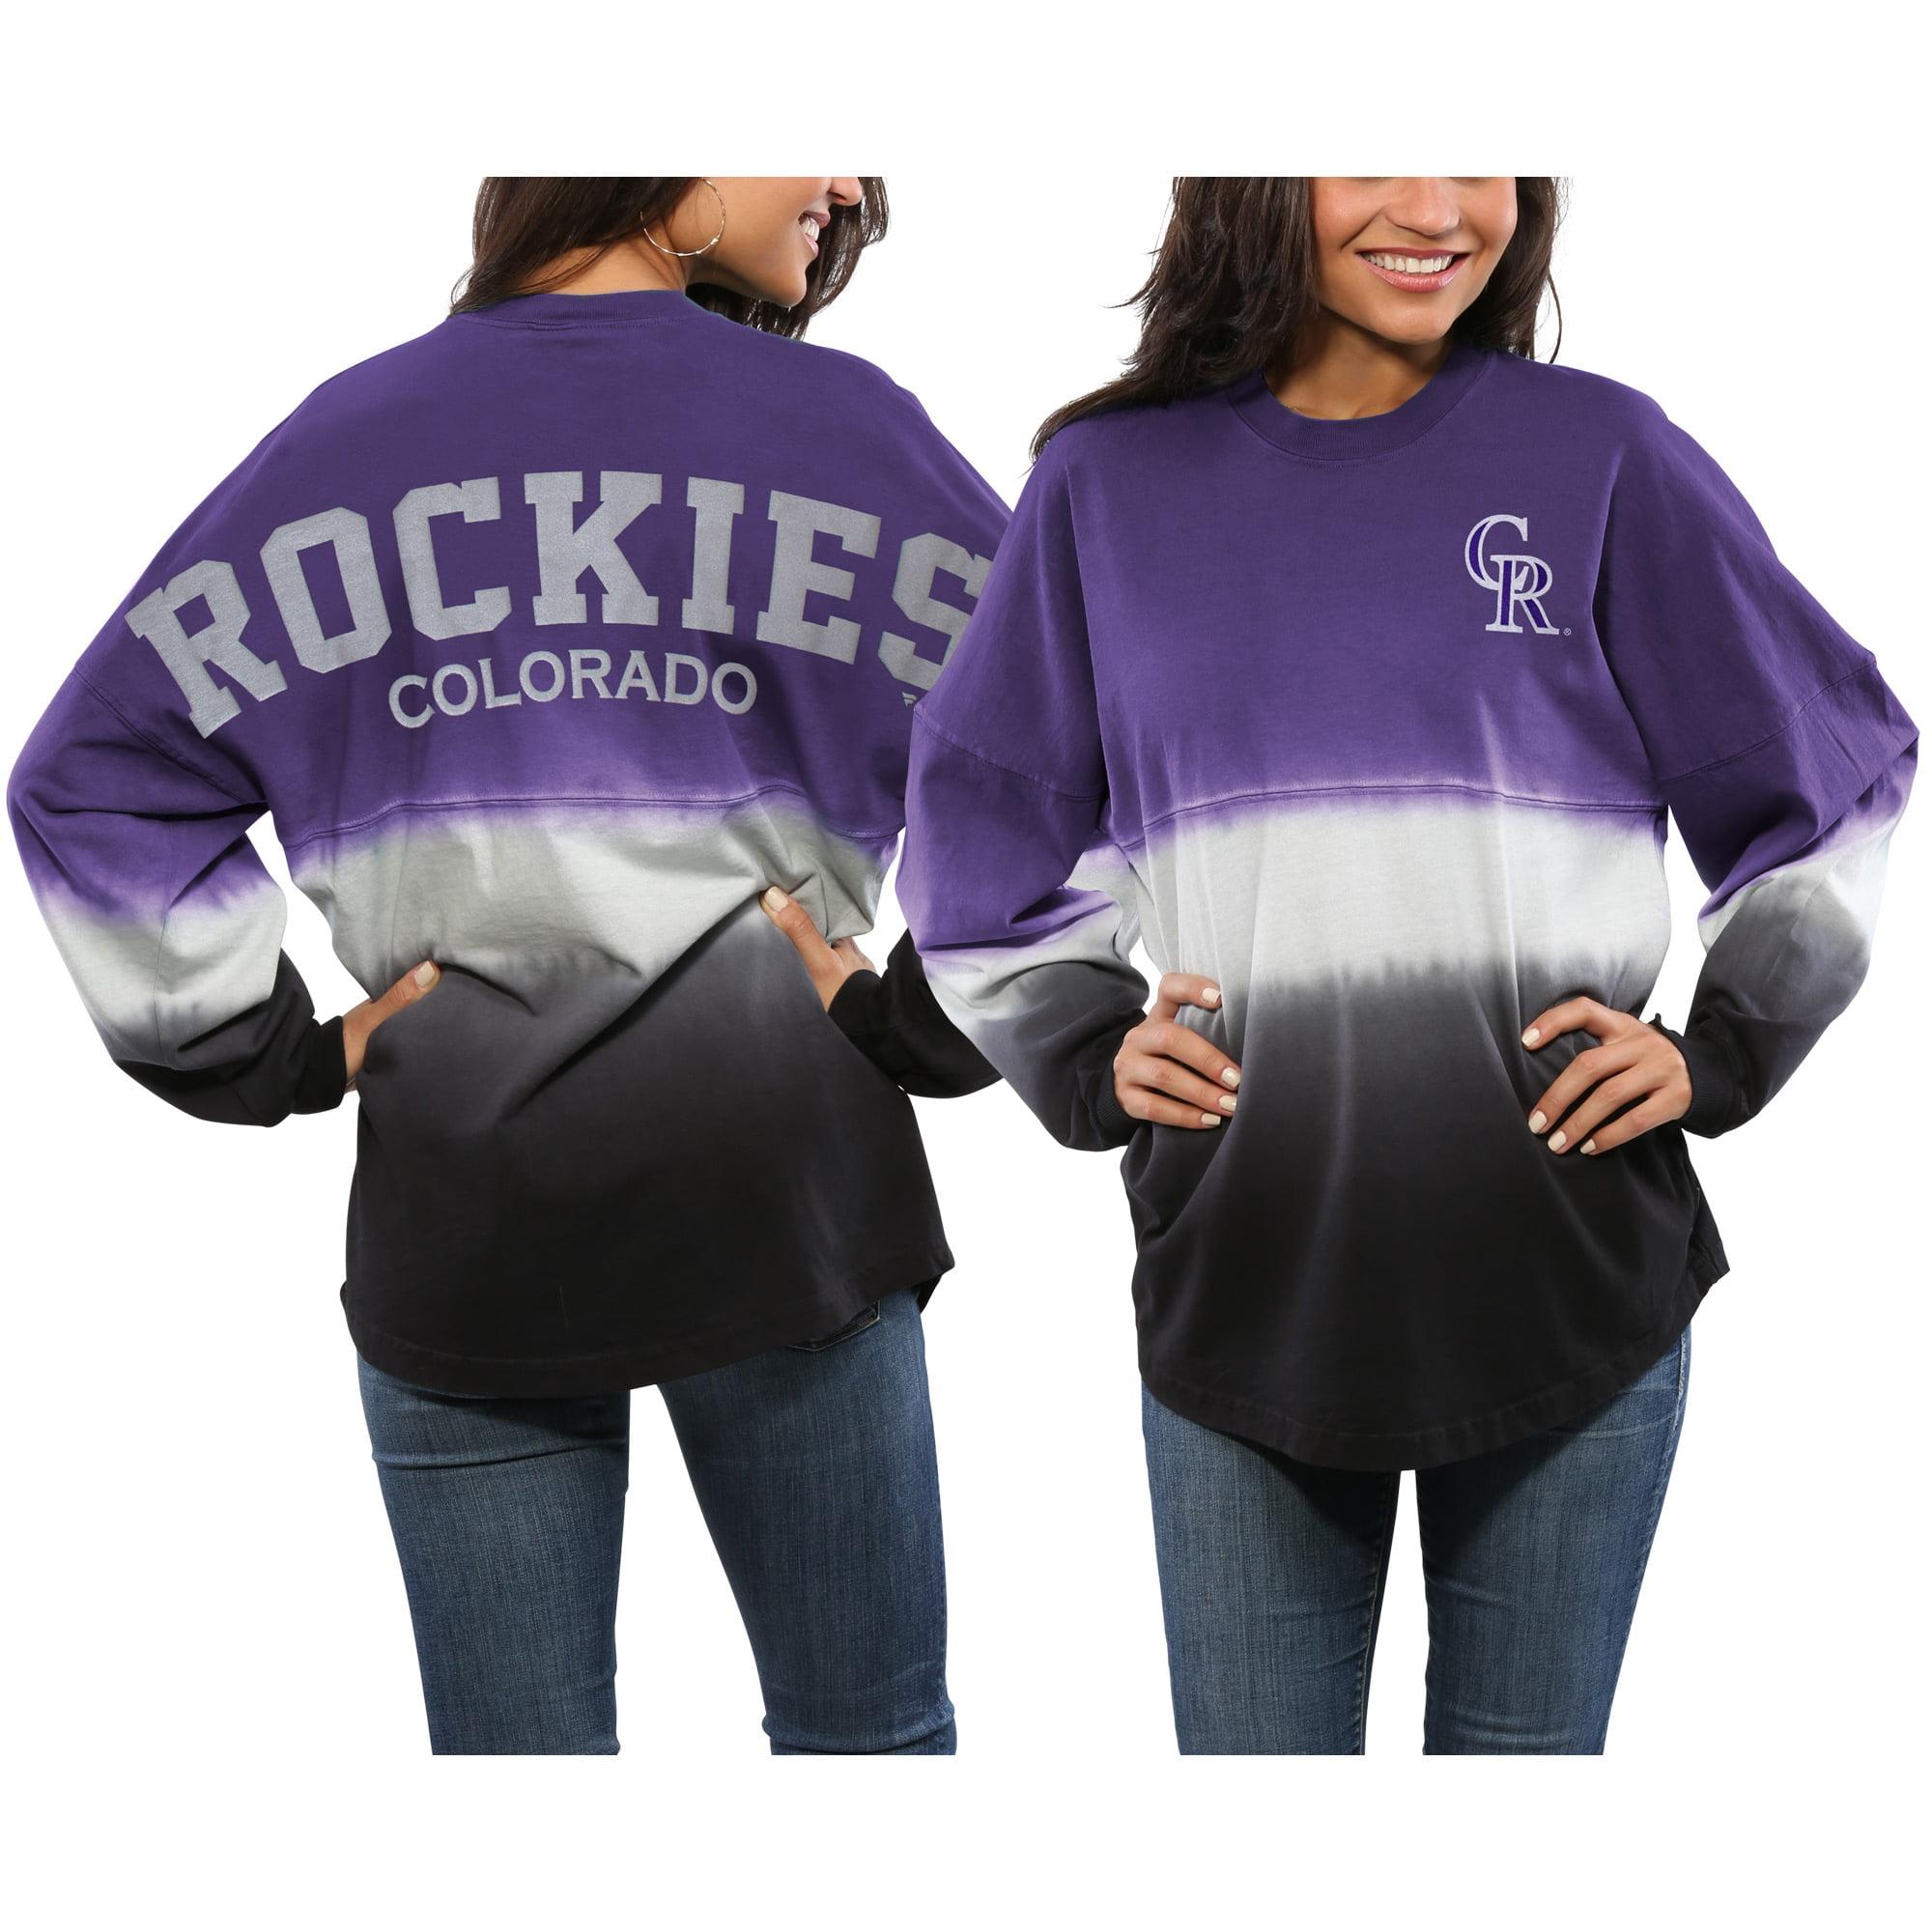 Colorado Rockies Women's Oversized Long Sleeve Ombre Spirit Jersey T-Shirt - Purple